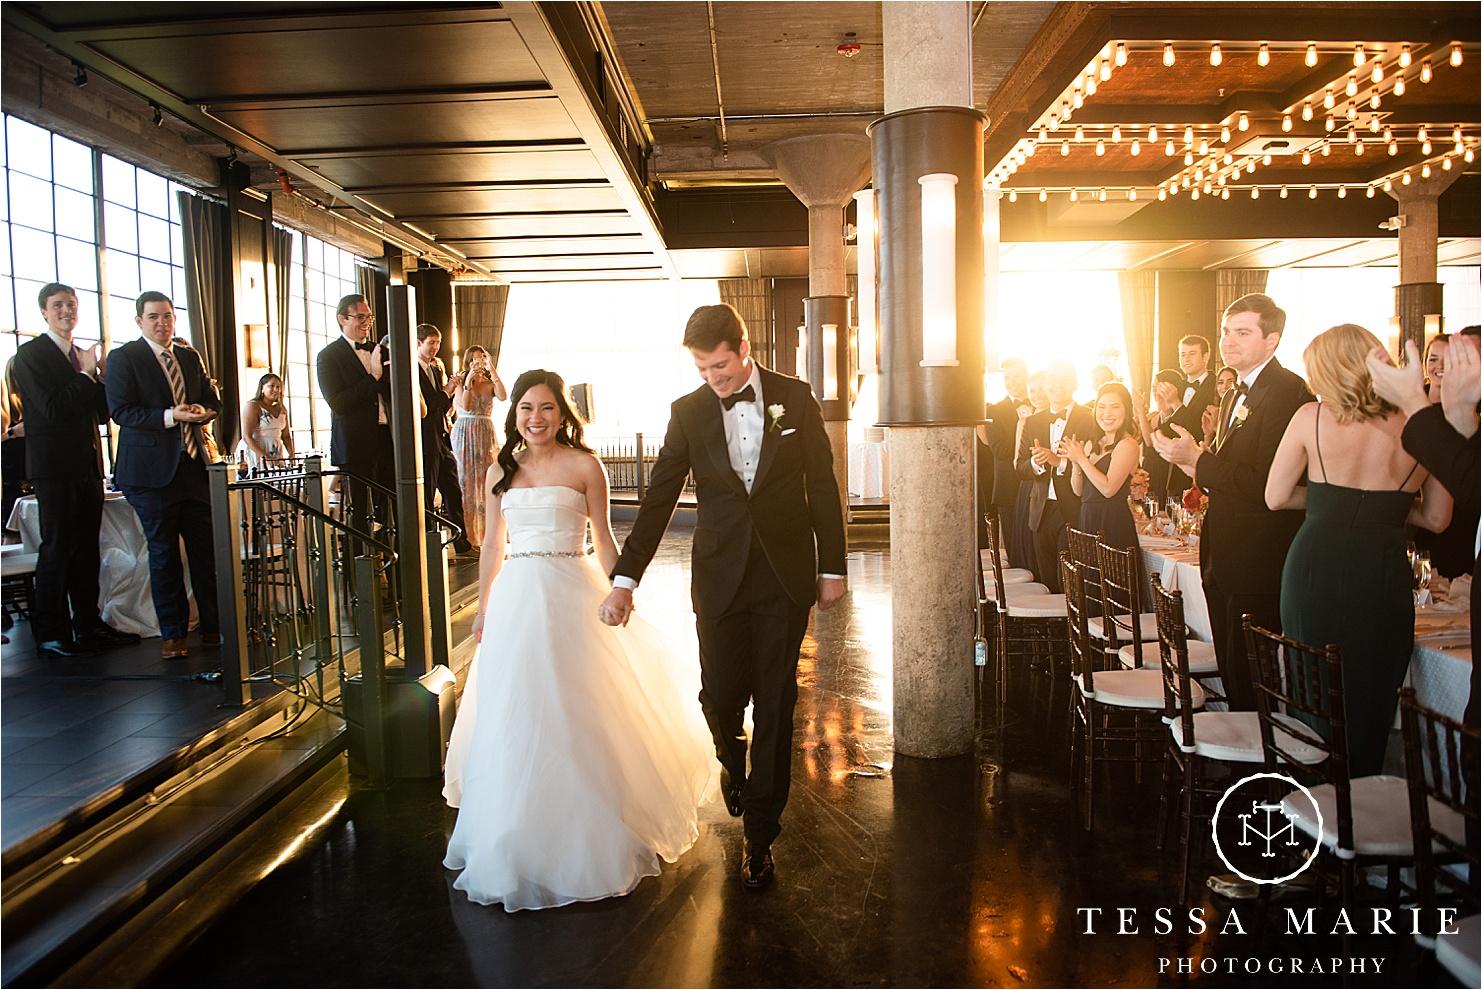 Tessa_marie_weddings_houston_wedding_photographer_The_astorian_0148.jpg